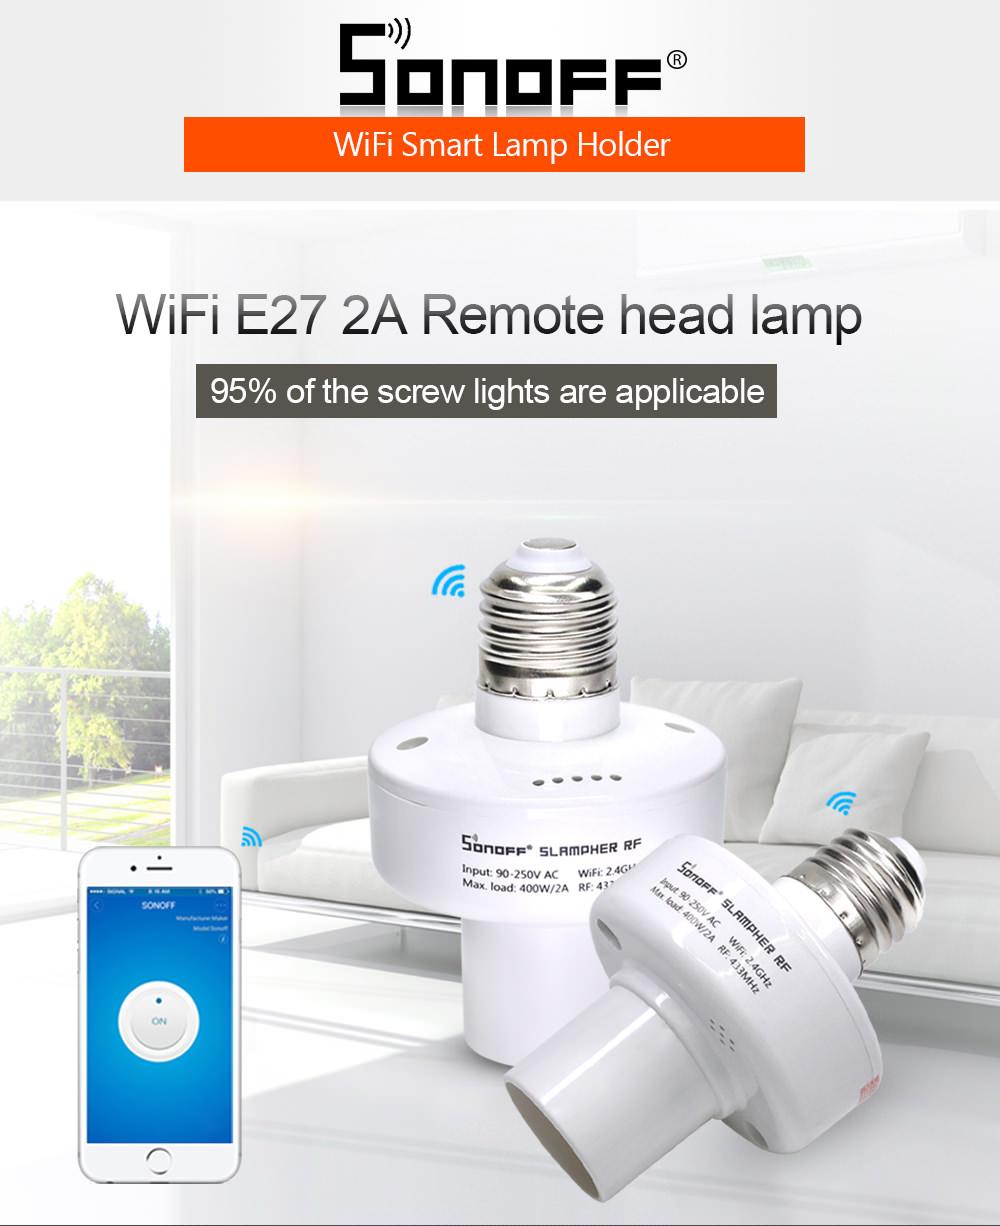 sonoff slampher rf smart lamp holder